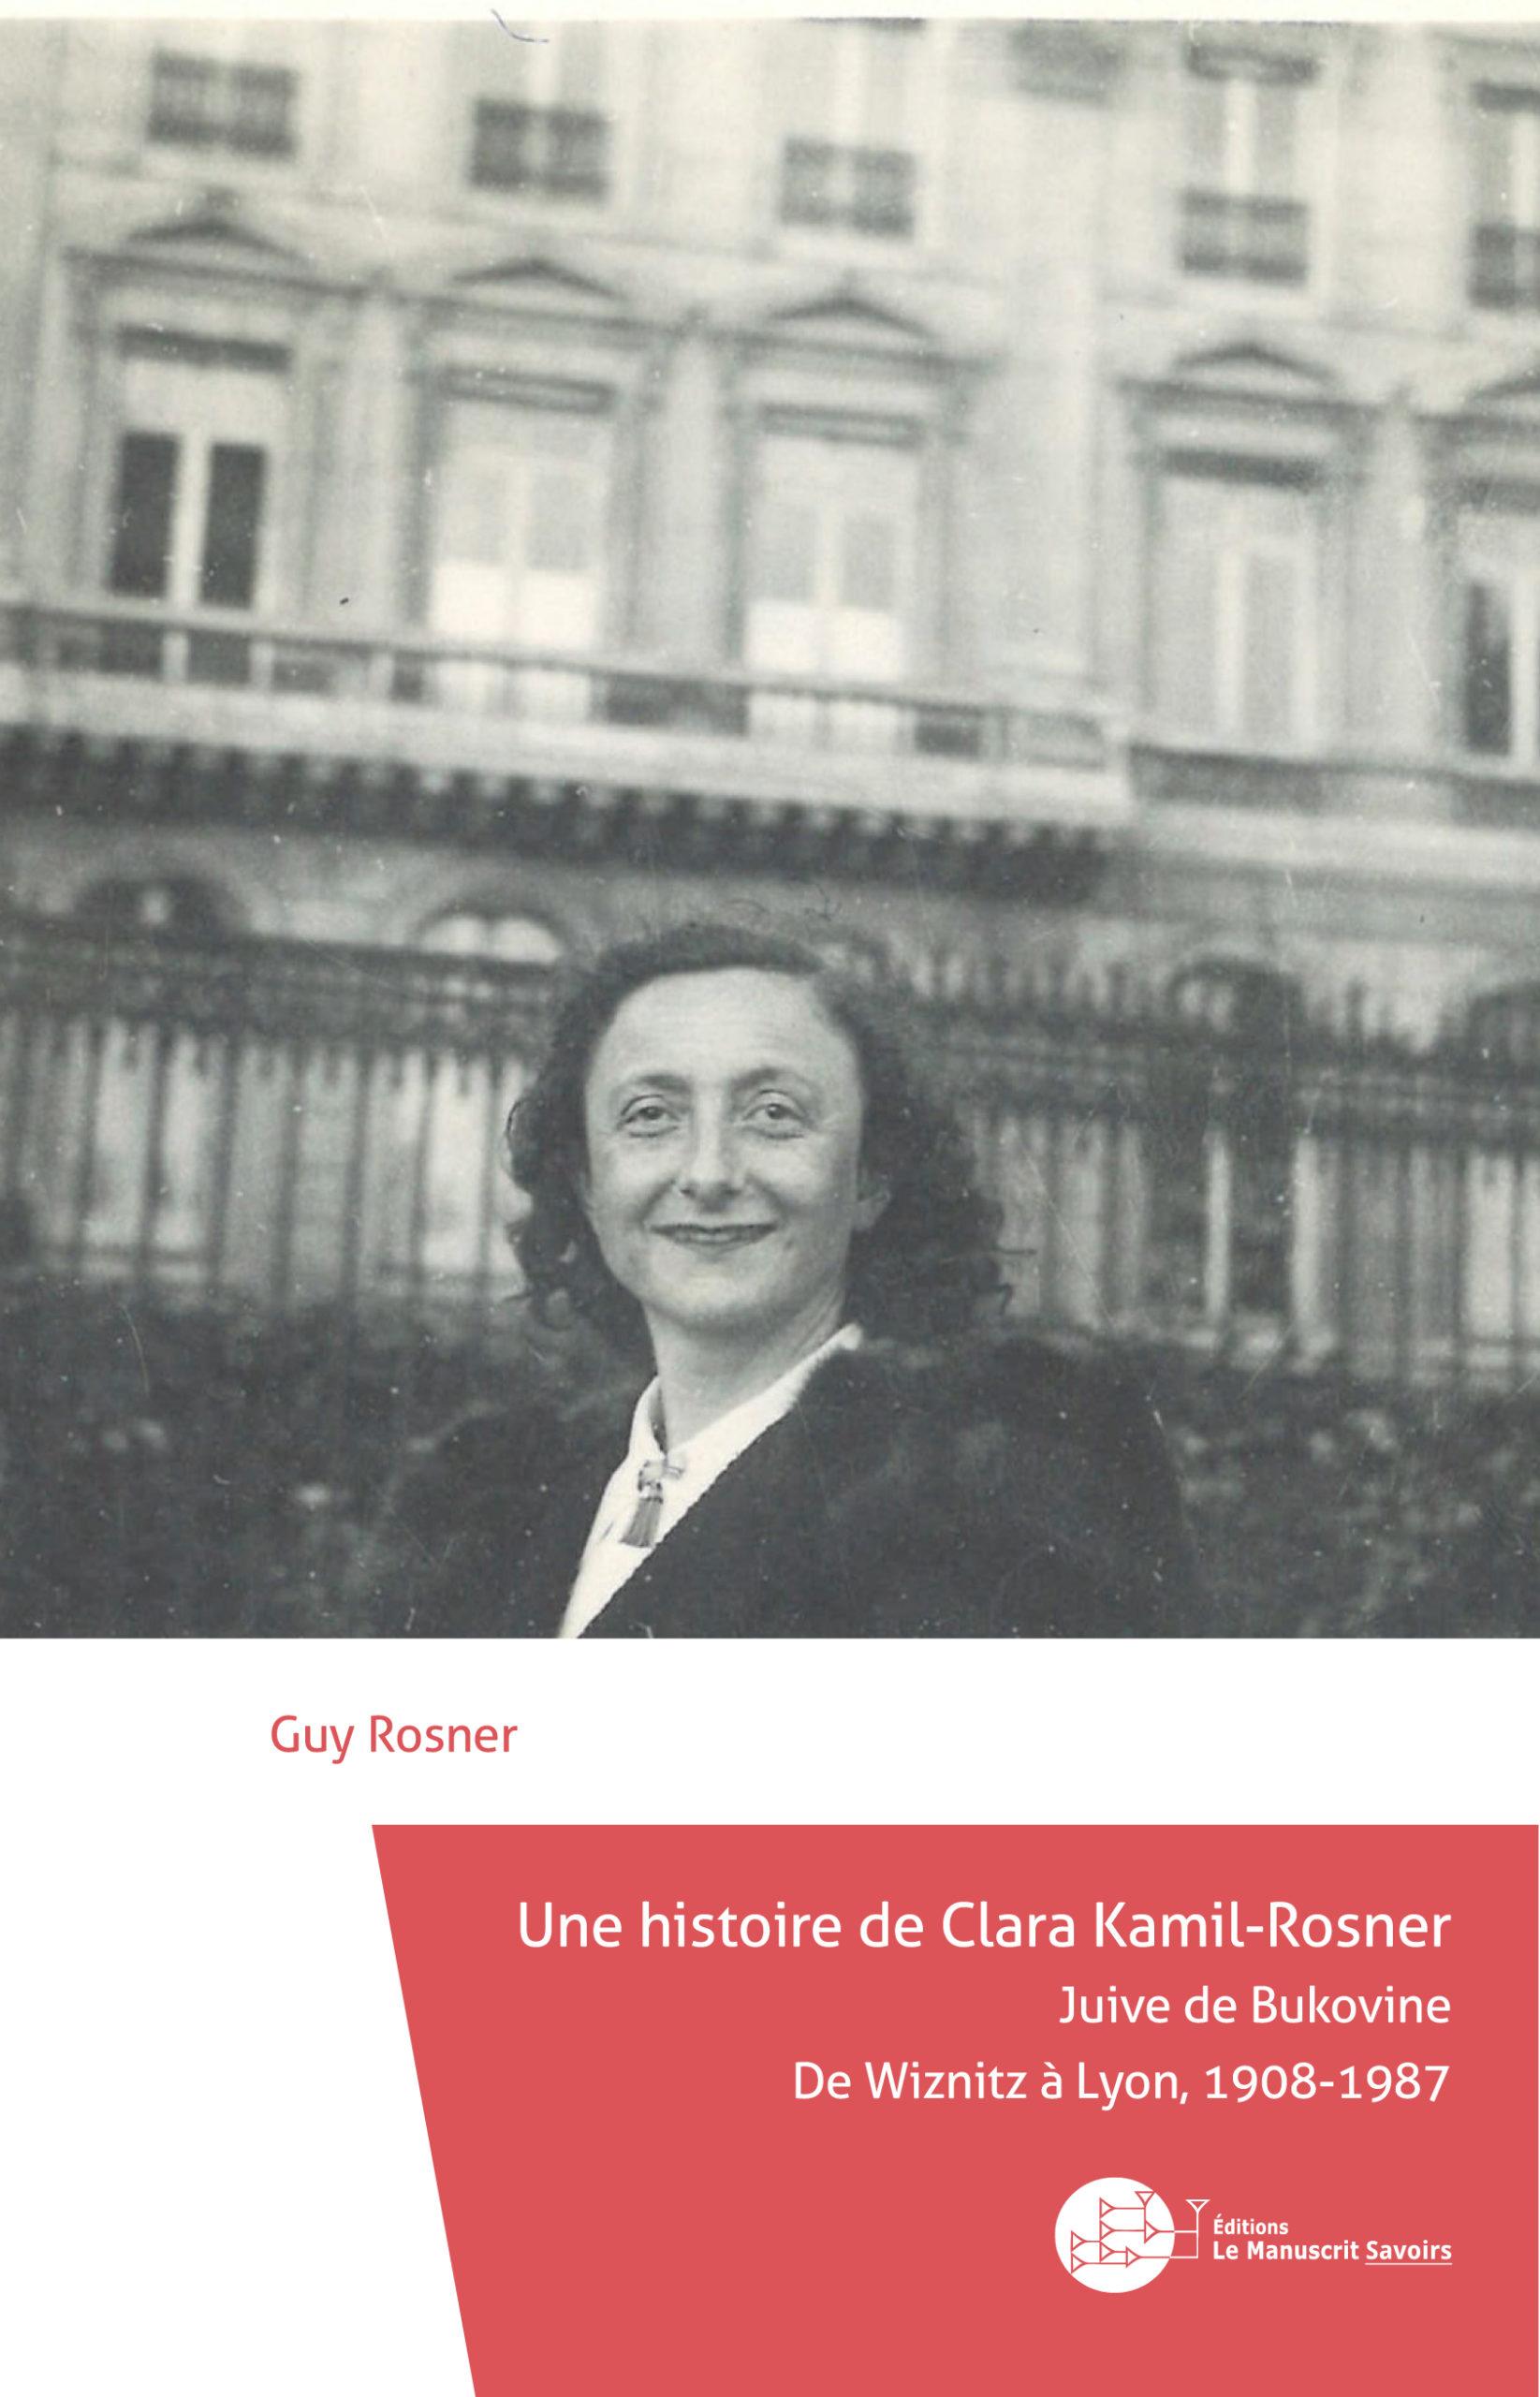 Une histoire de Clara Kamil-Rosner